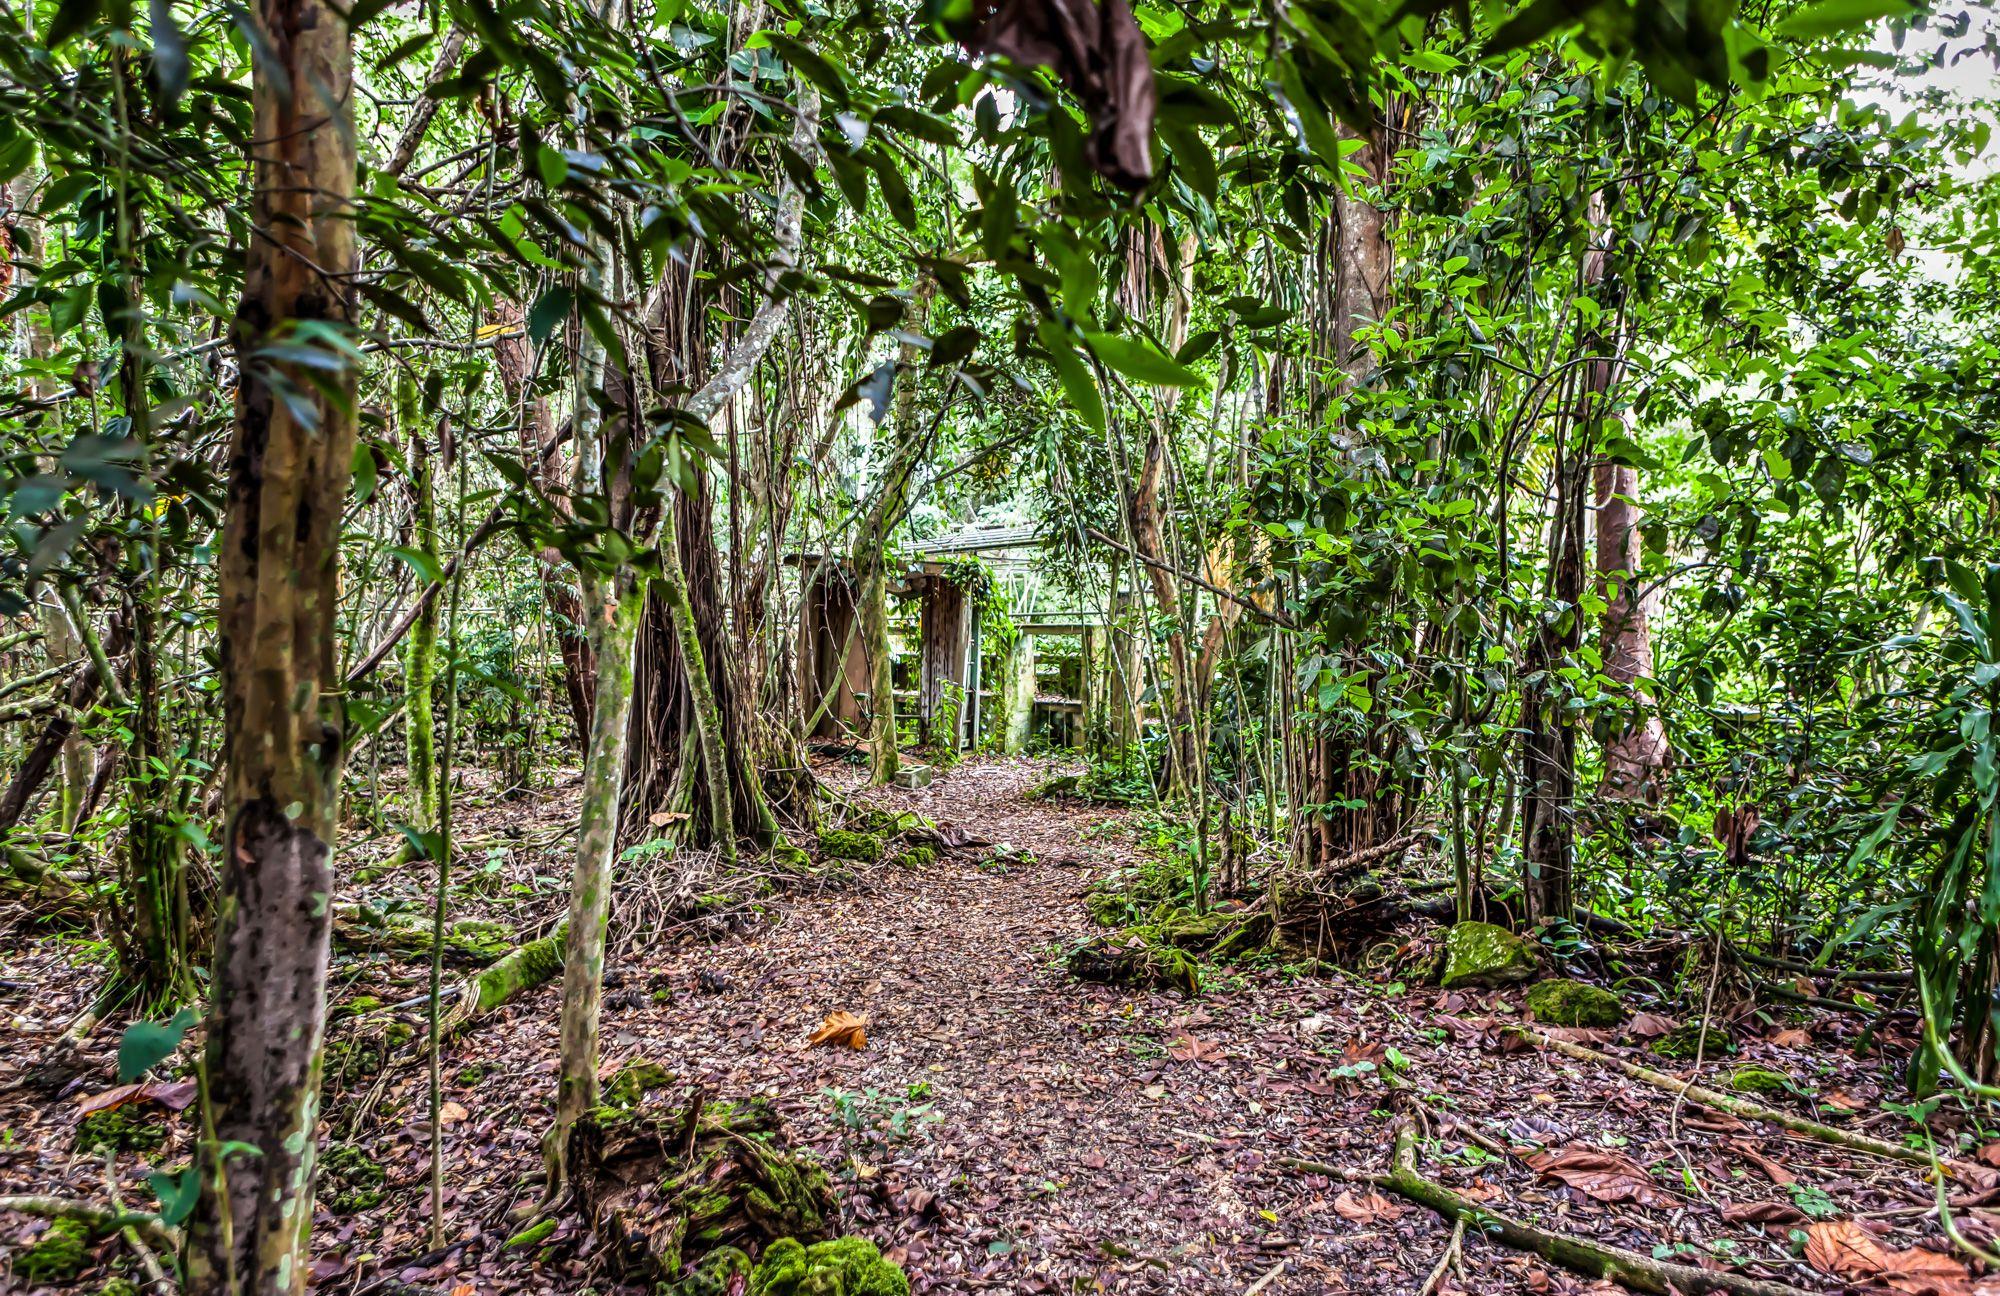 A Small Jungle Adventure Just South of Miami